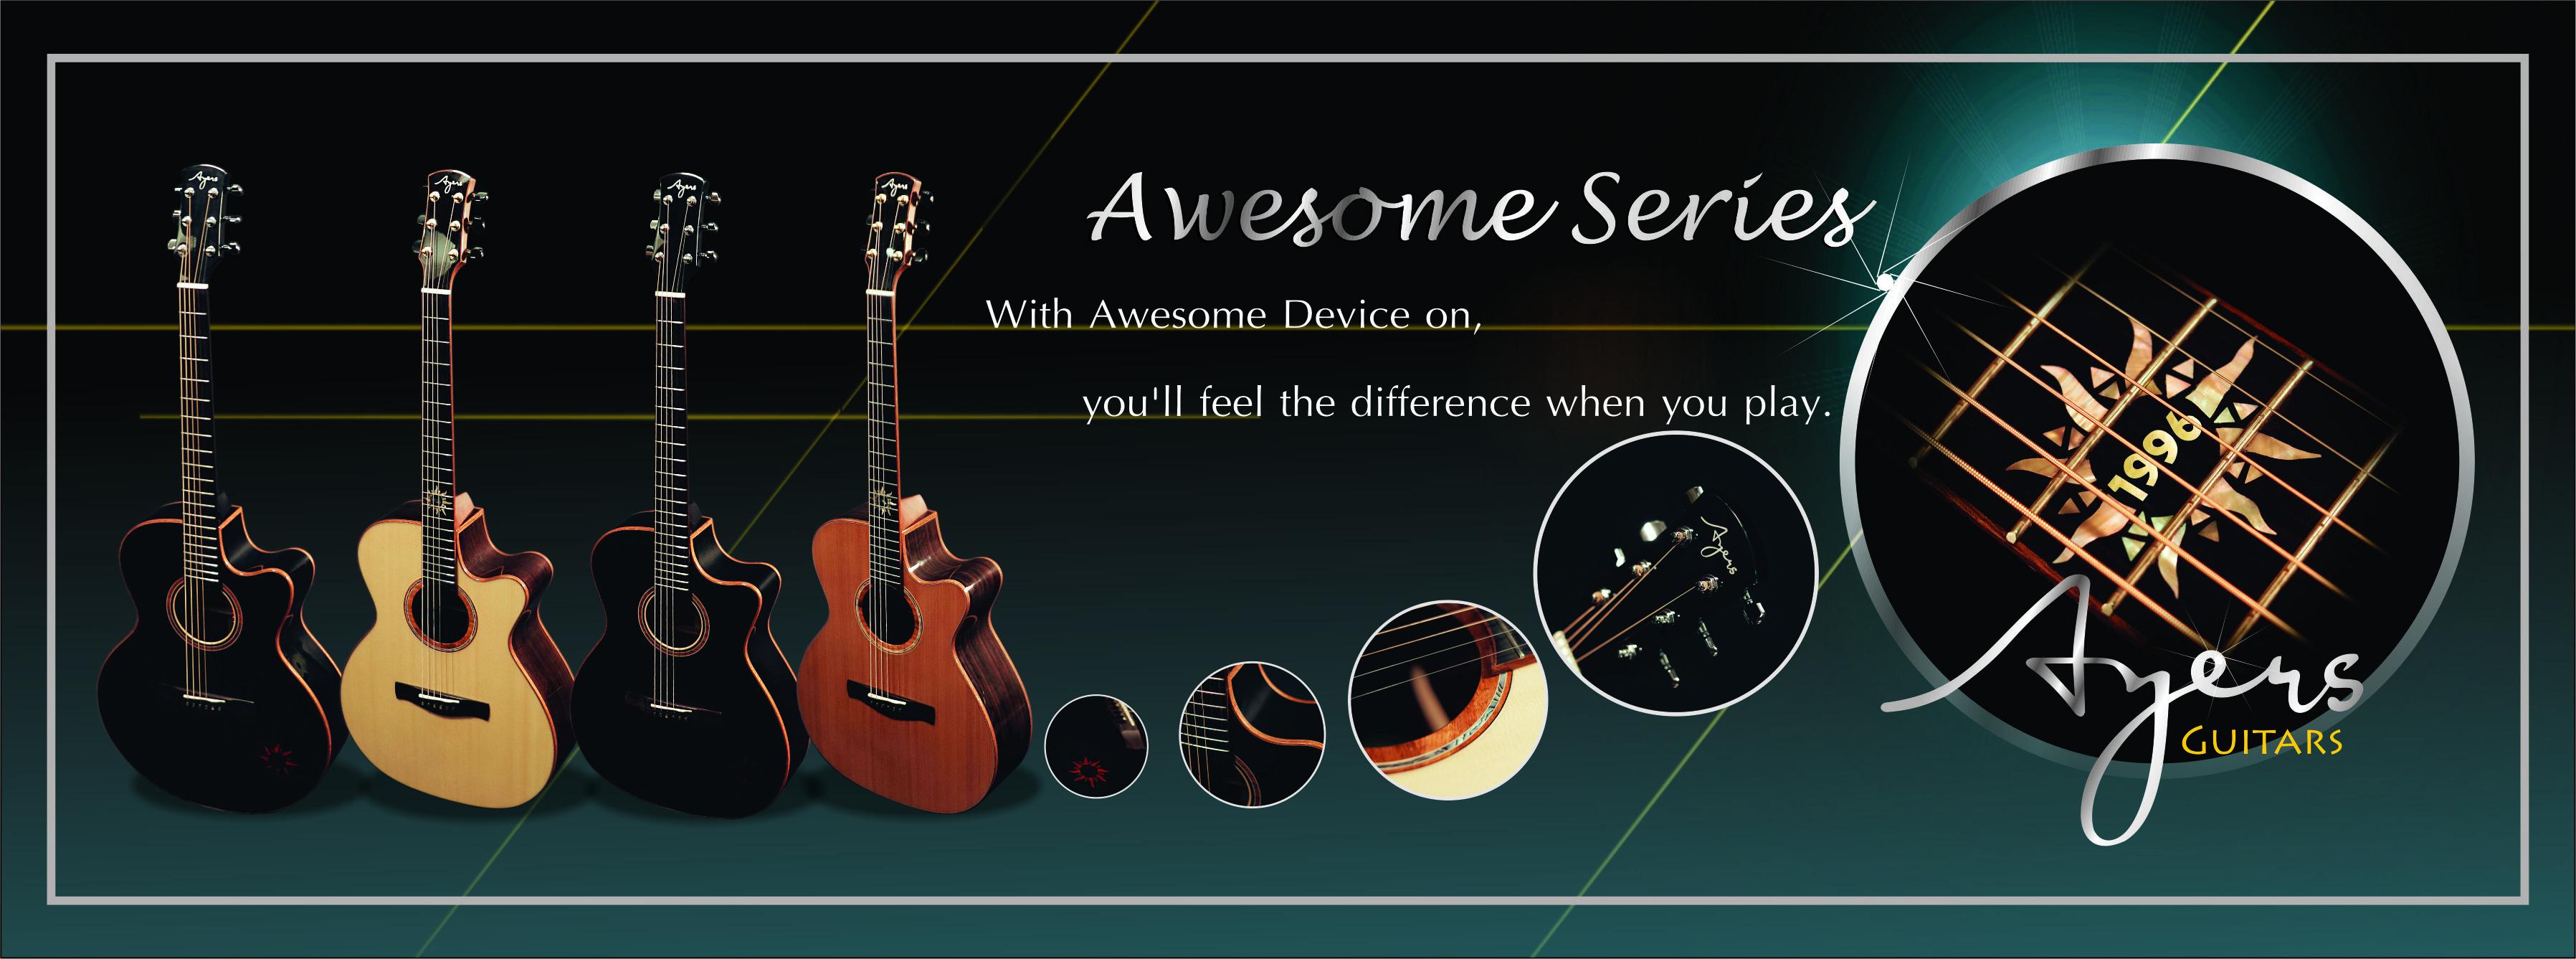 ayers guitar 2020 latest guitar models